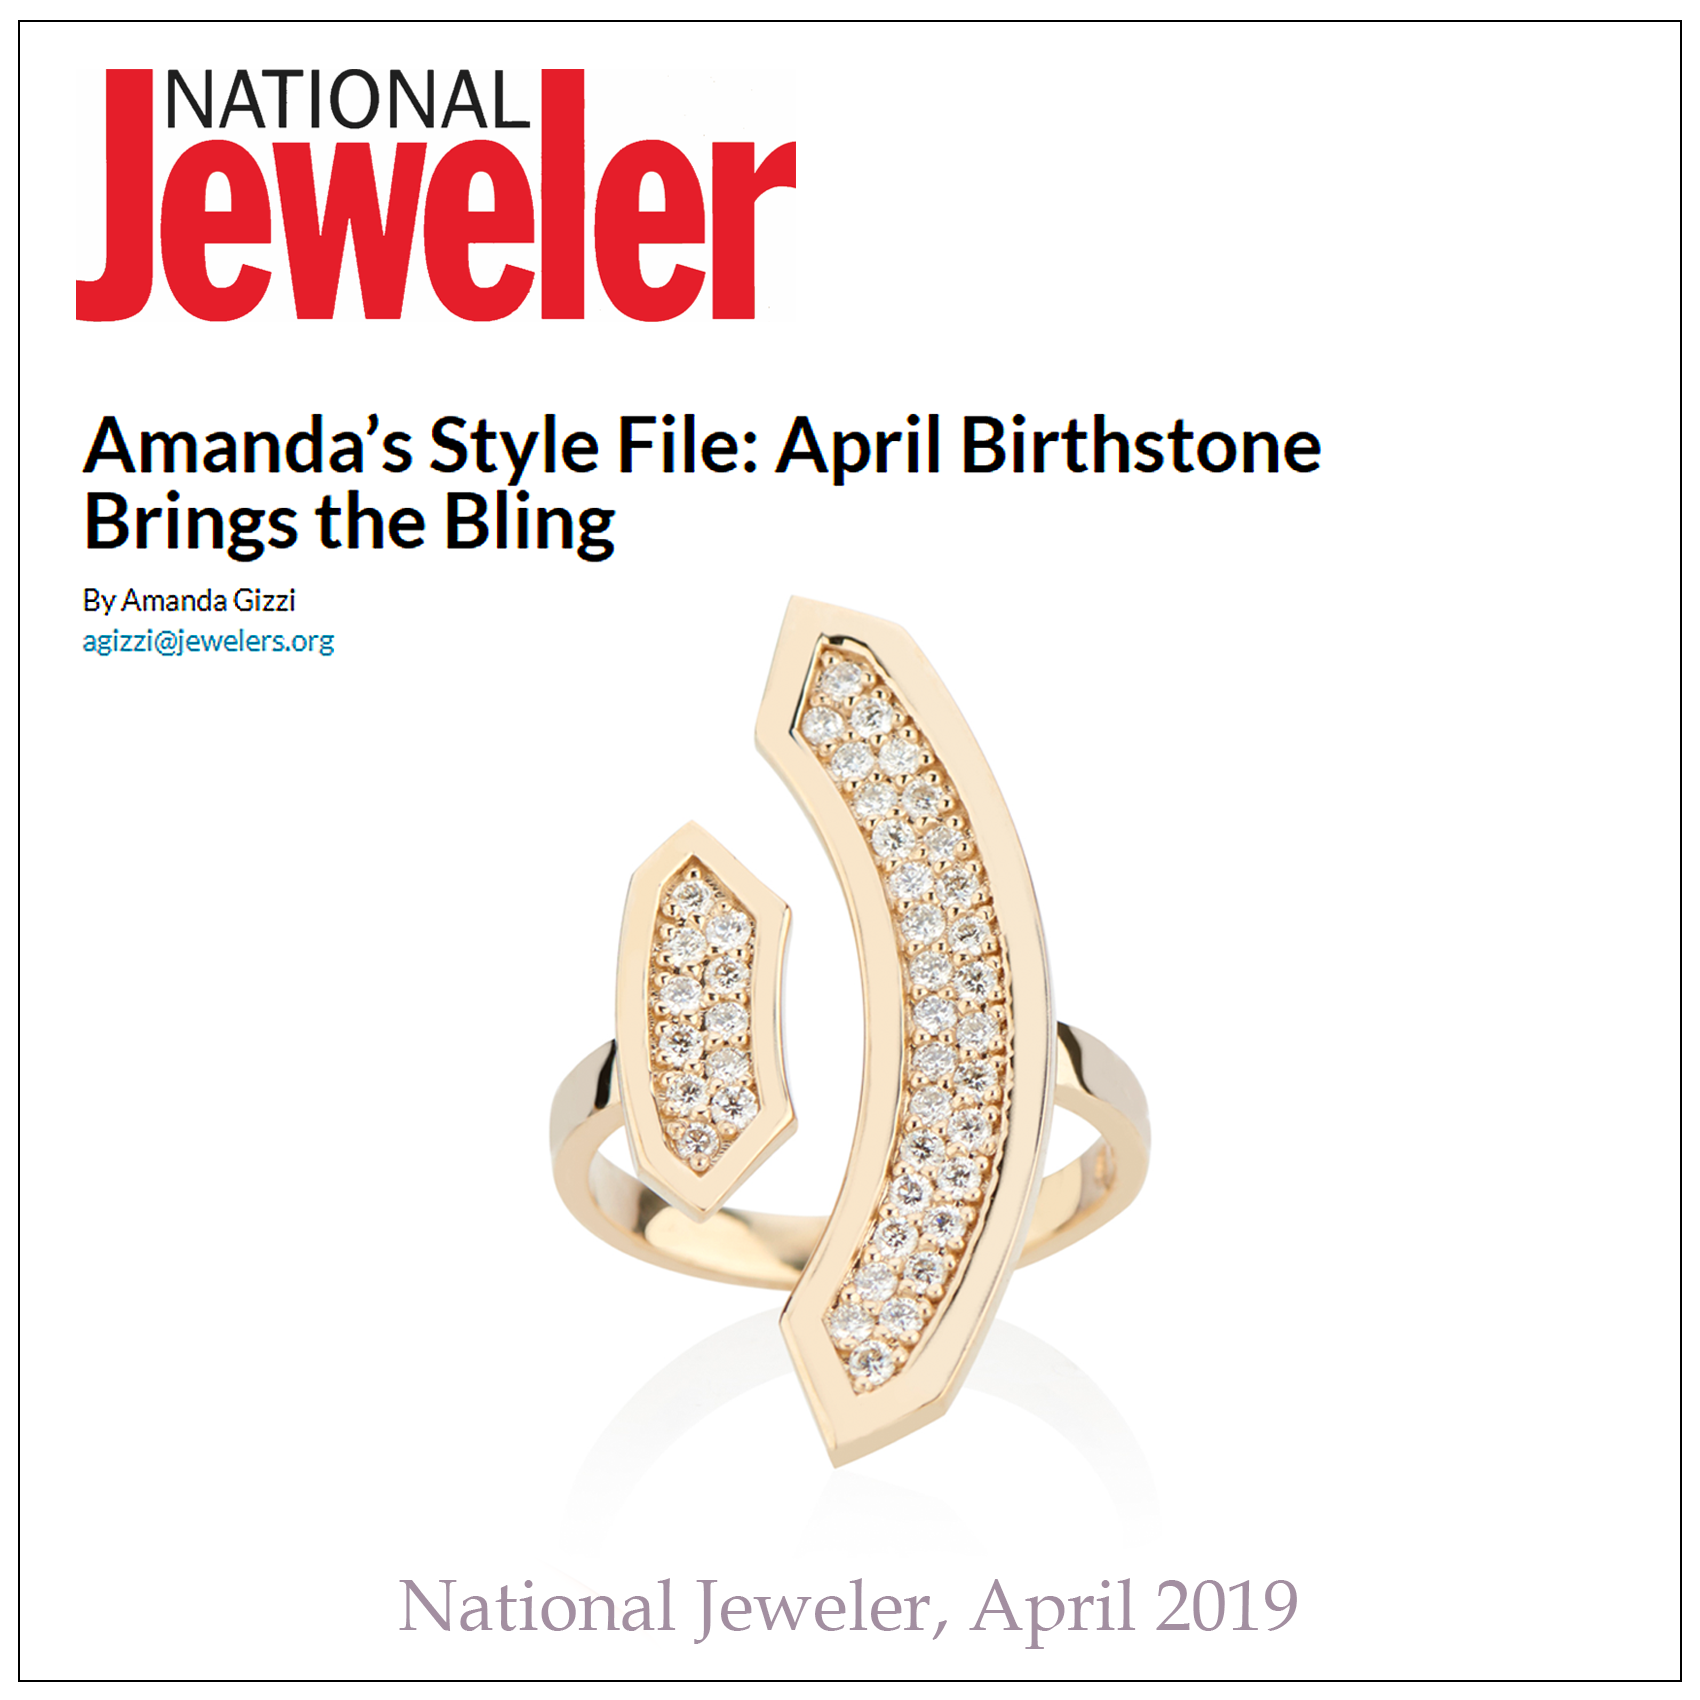 national-jeweler-april-2019-stellara.png